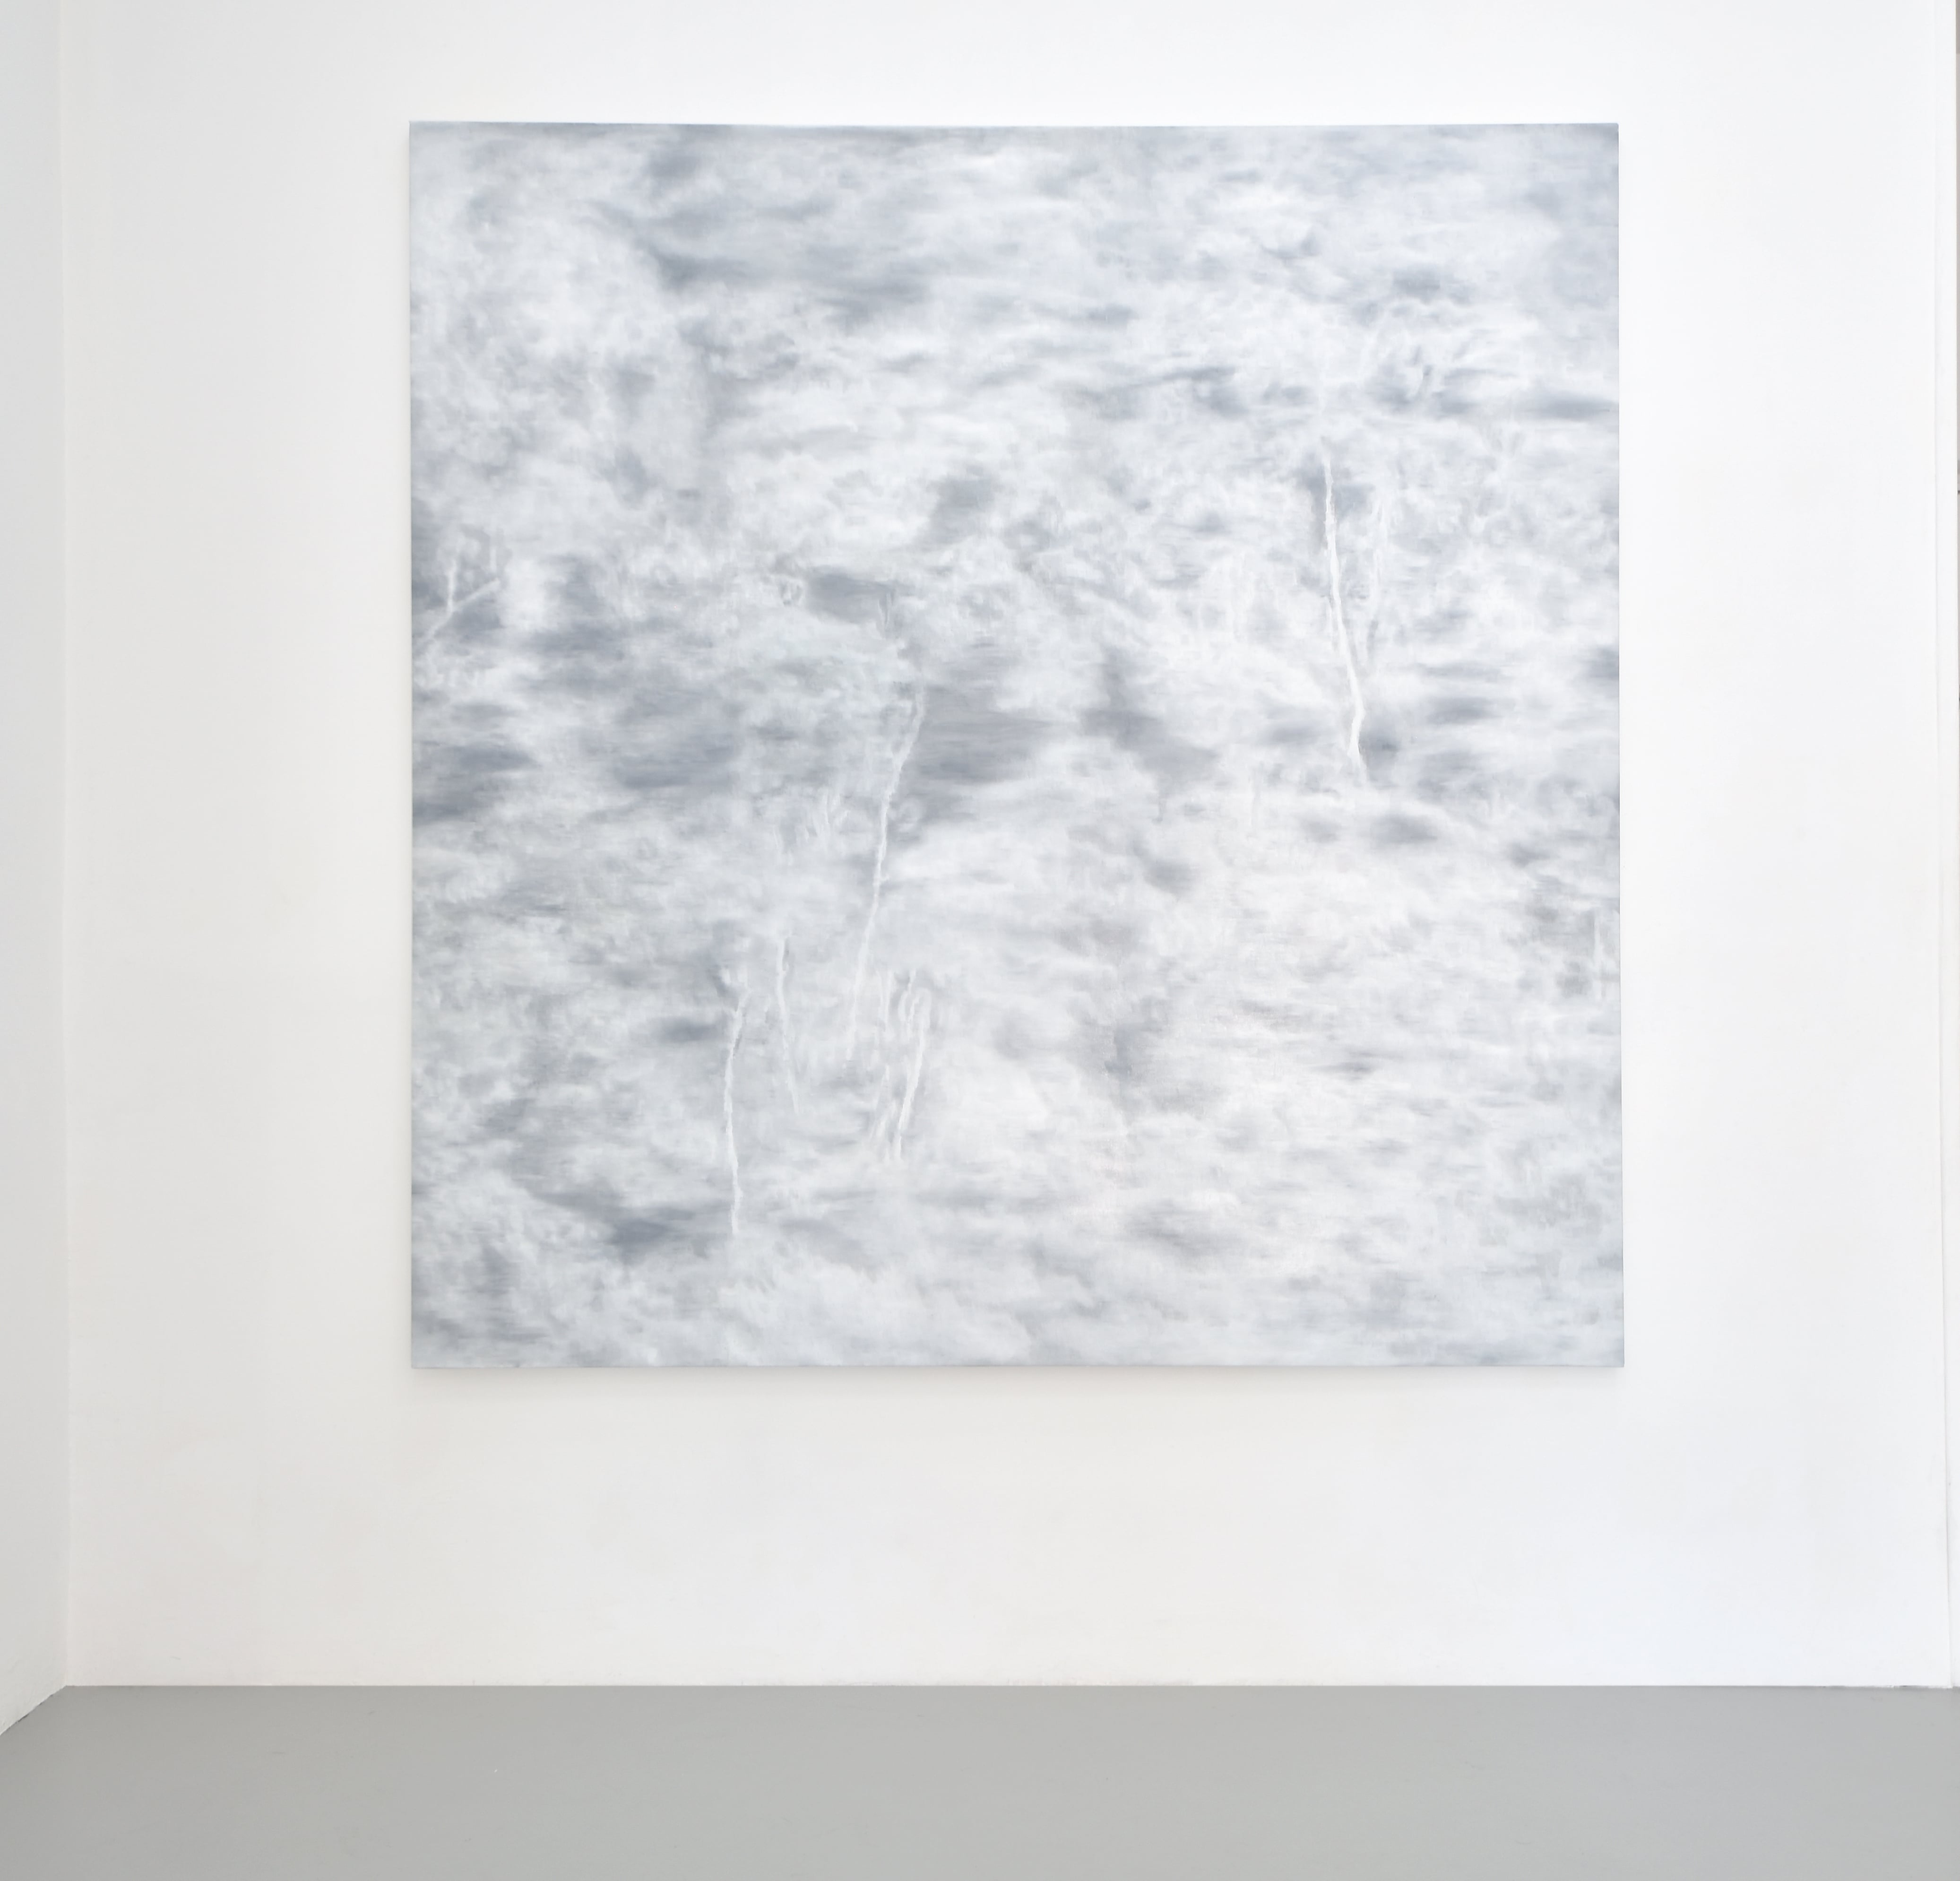 Fitzcarraldo, 2020 Oil on linen canvas, 200x200 cm